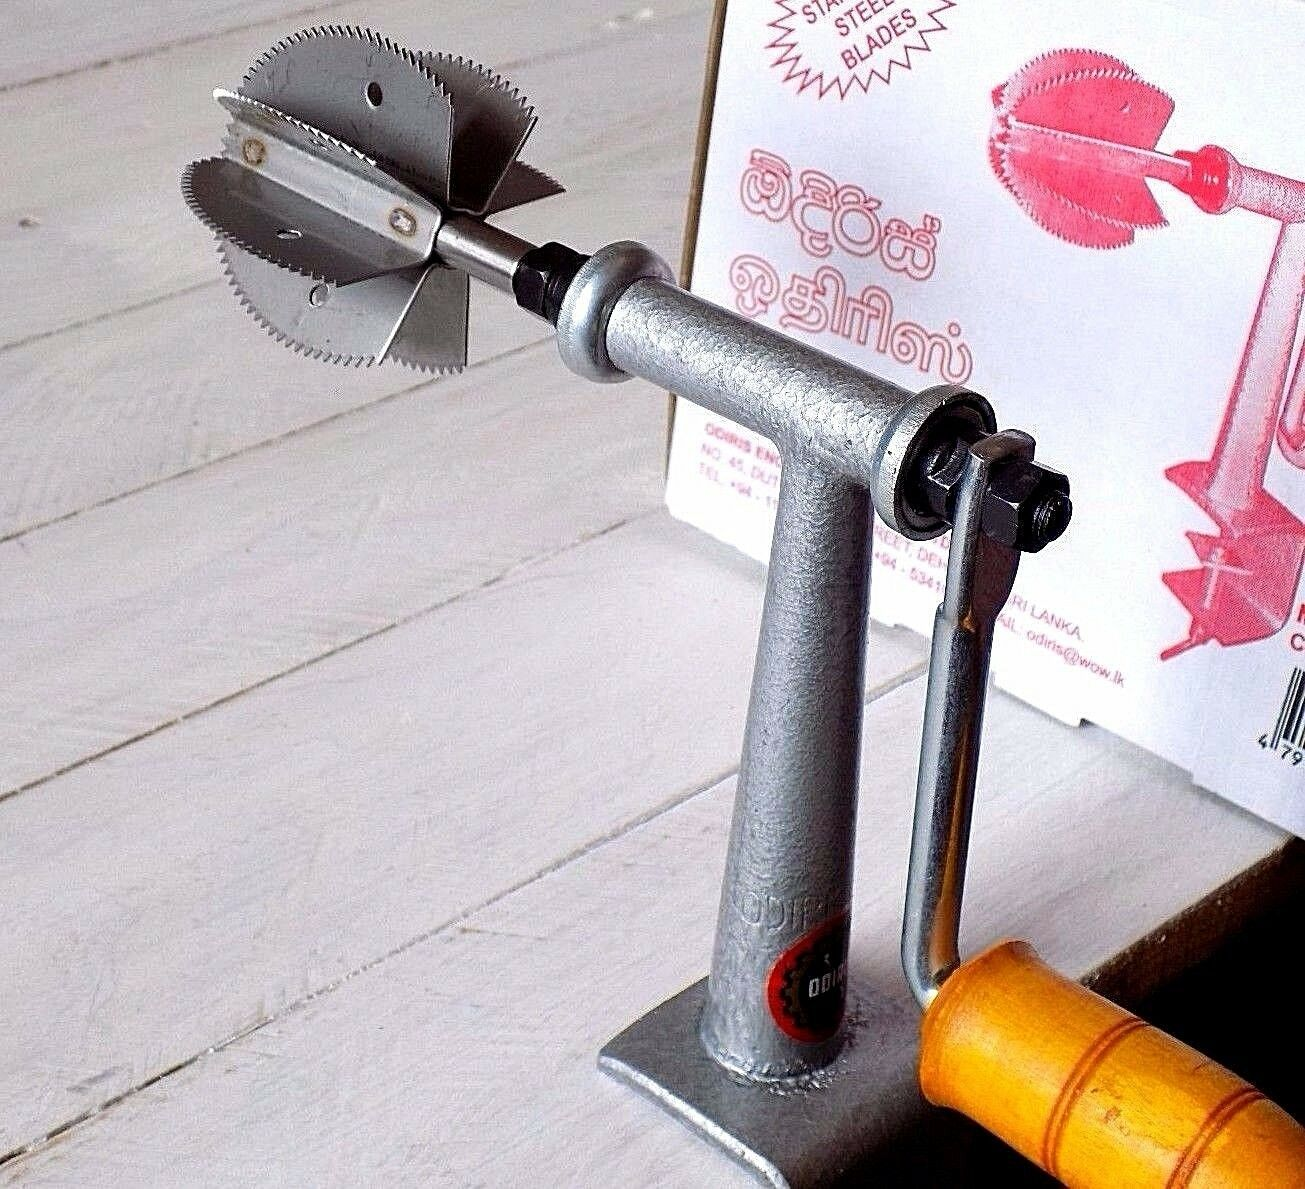 Coconut Scraper Ordiris Coconut grater , stainless steel blade UK Seller